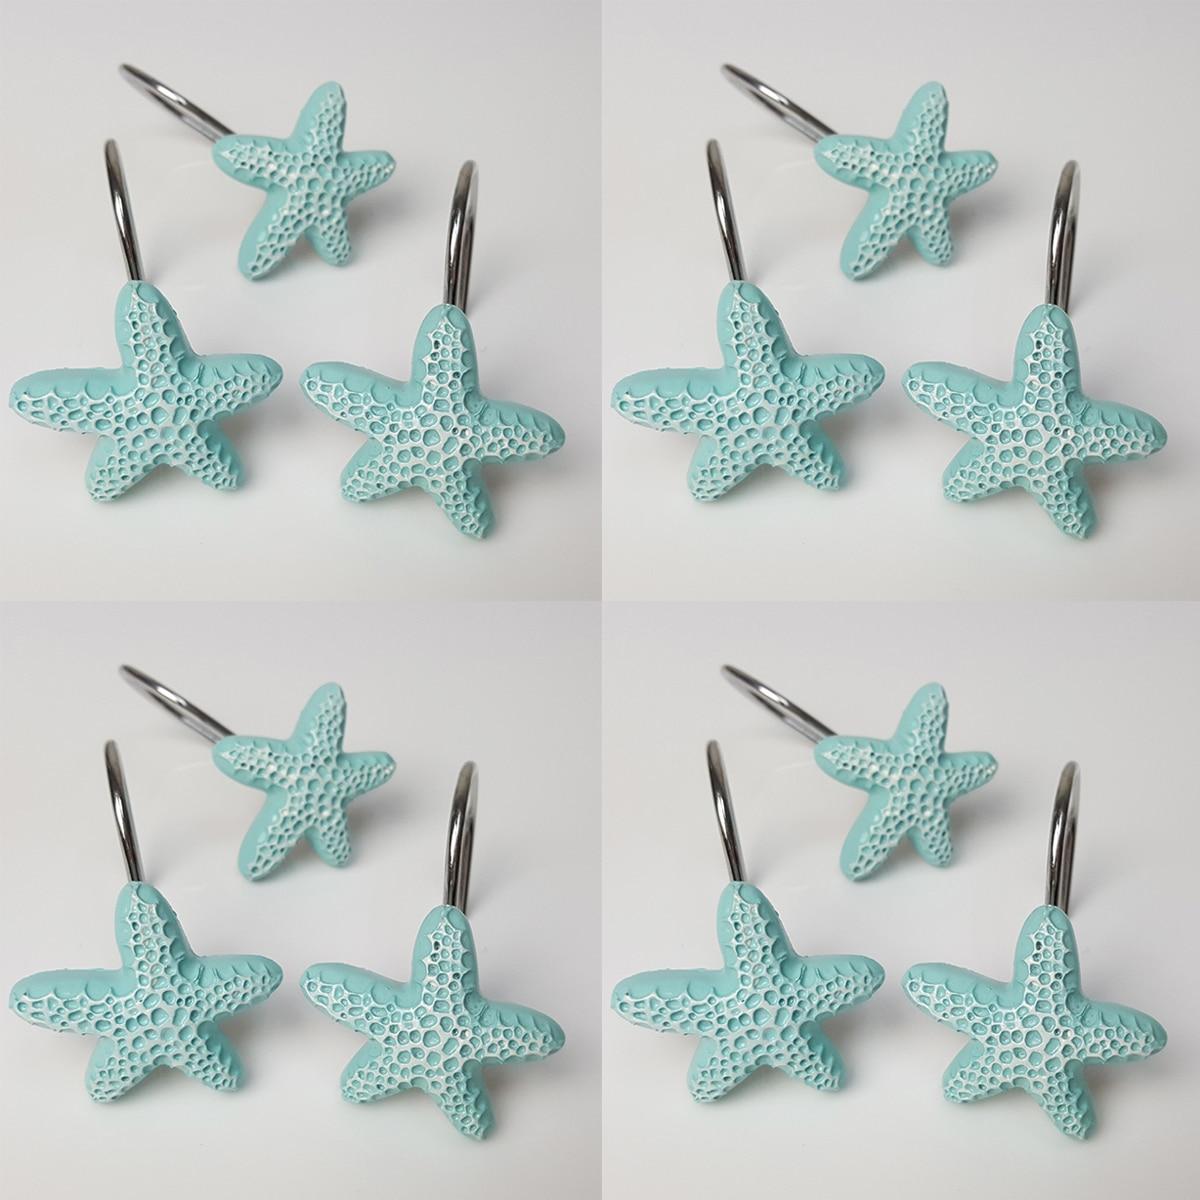 Blue Resin Sea Star Shower Curtain Hooks Bath Hanger Holder Hotel Home Decoration Bathroom Accessories 12PCS Set